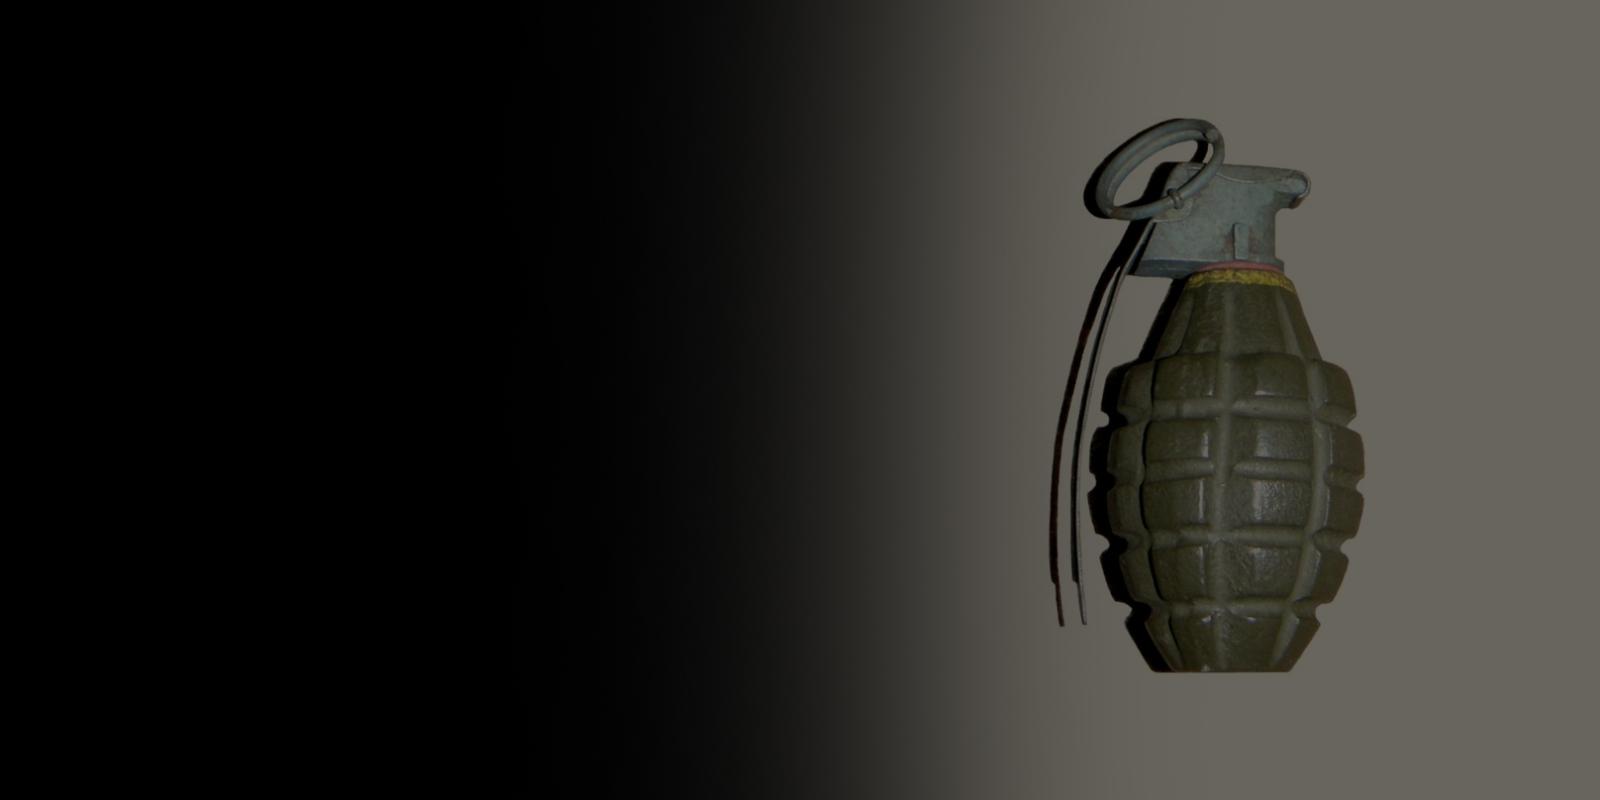 Mk 2 hand grenade